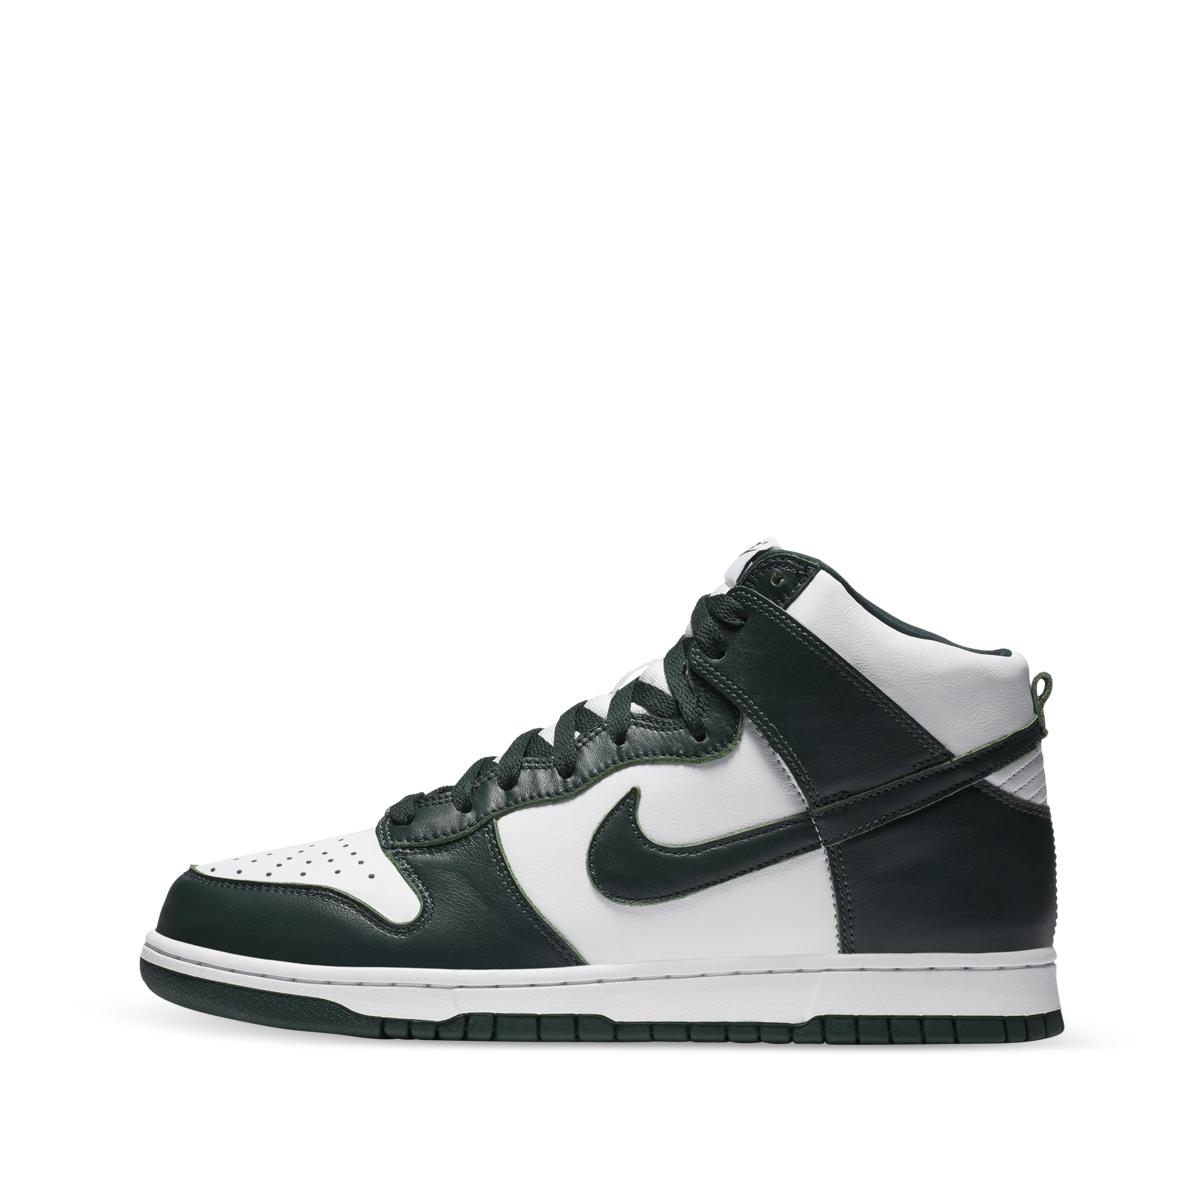 Nike Dunk HI SP